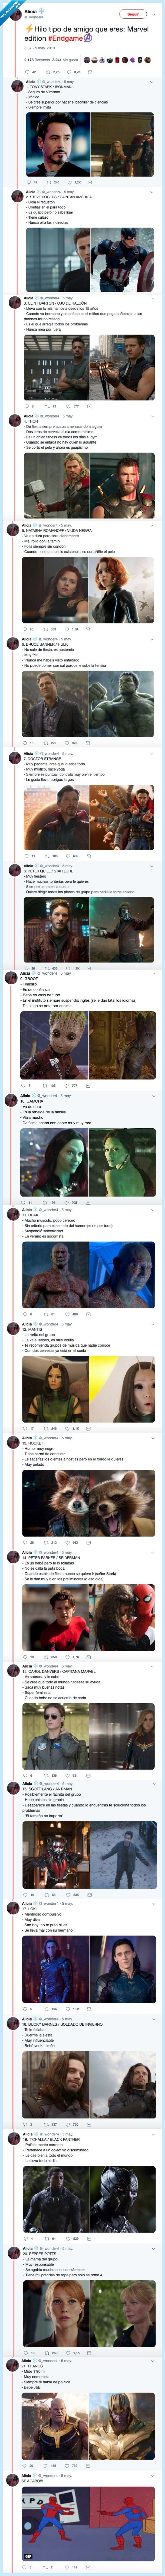 avengers,iron man,personalidad,spiderman,test,thor,tipo,vengadores,viuda negra